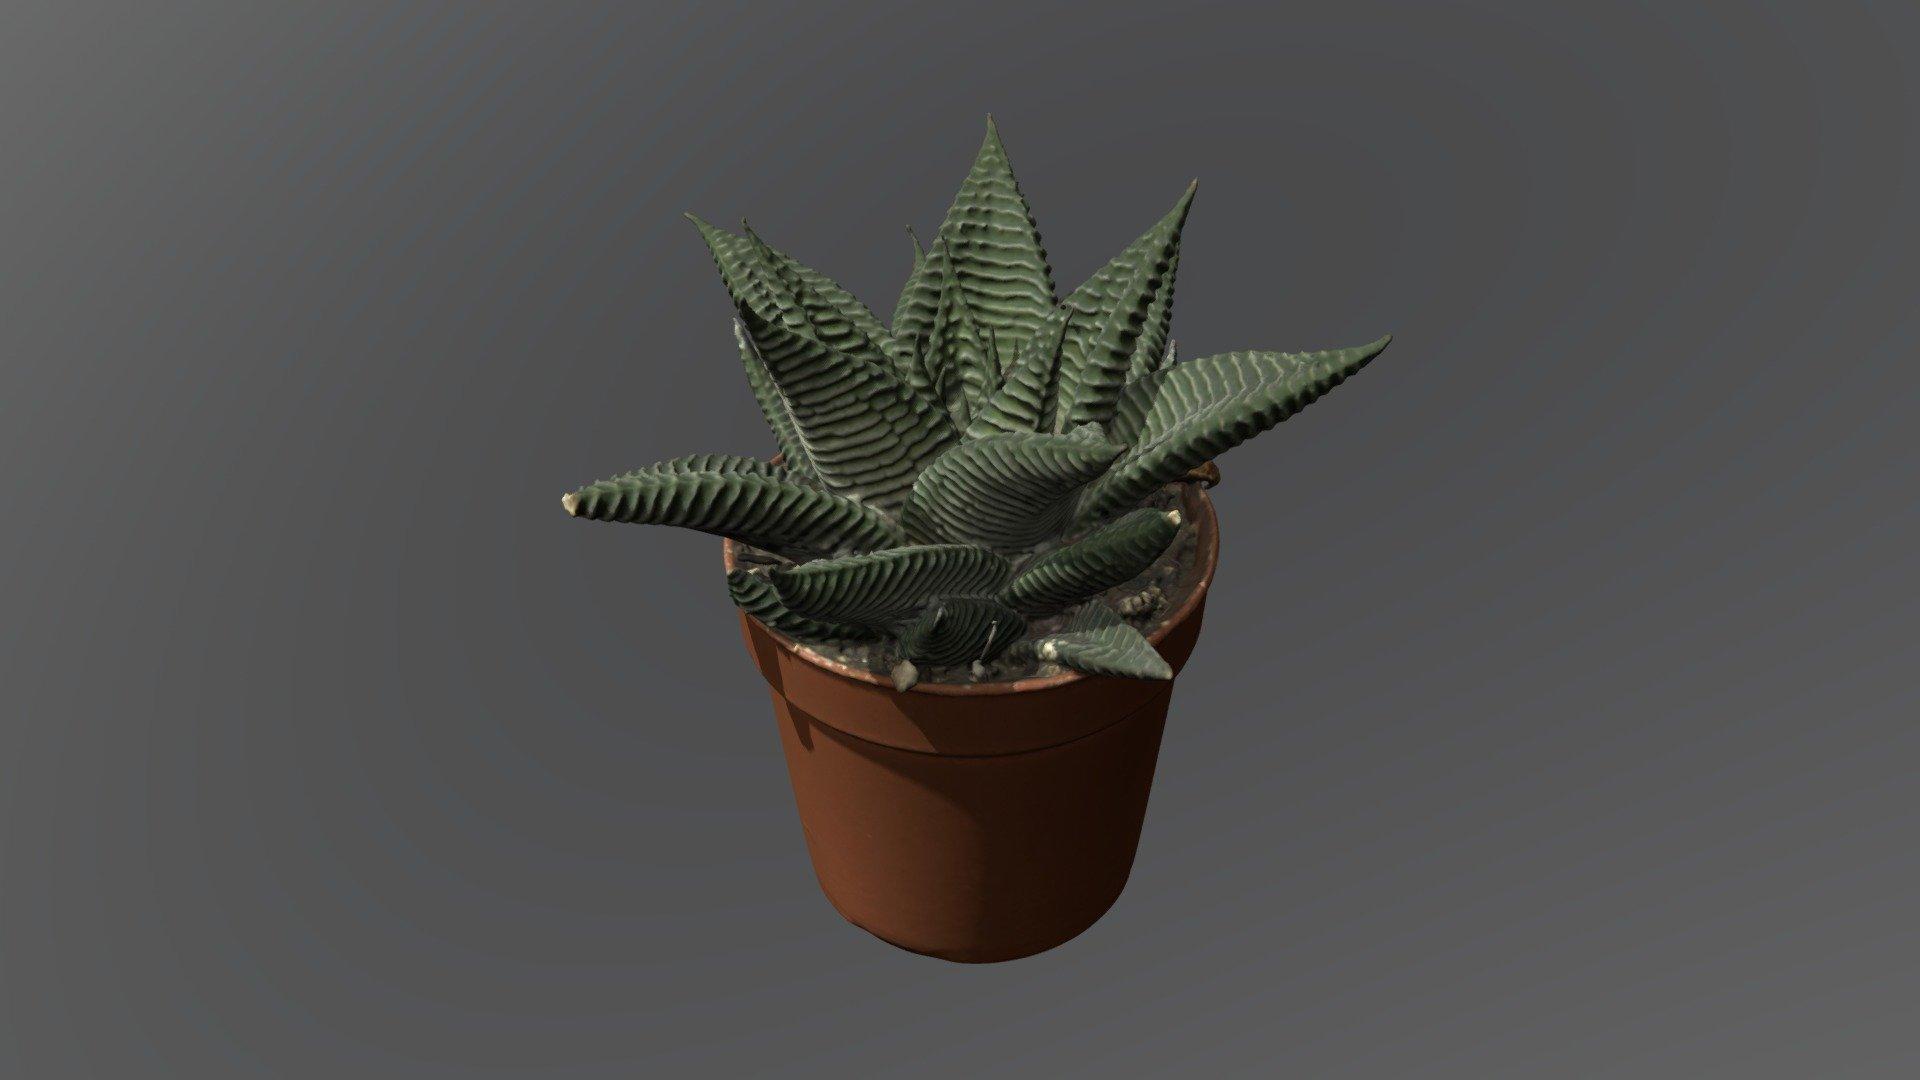 best place to buy succulents online